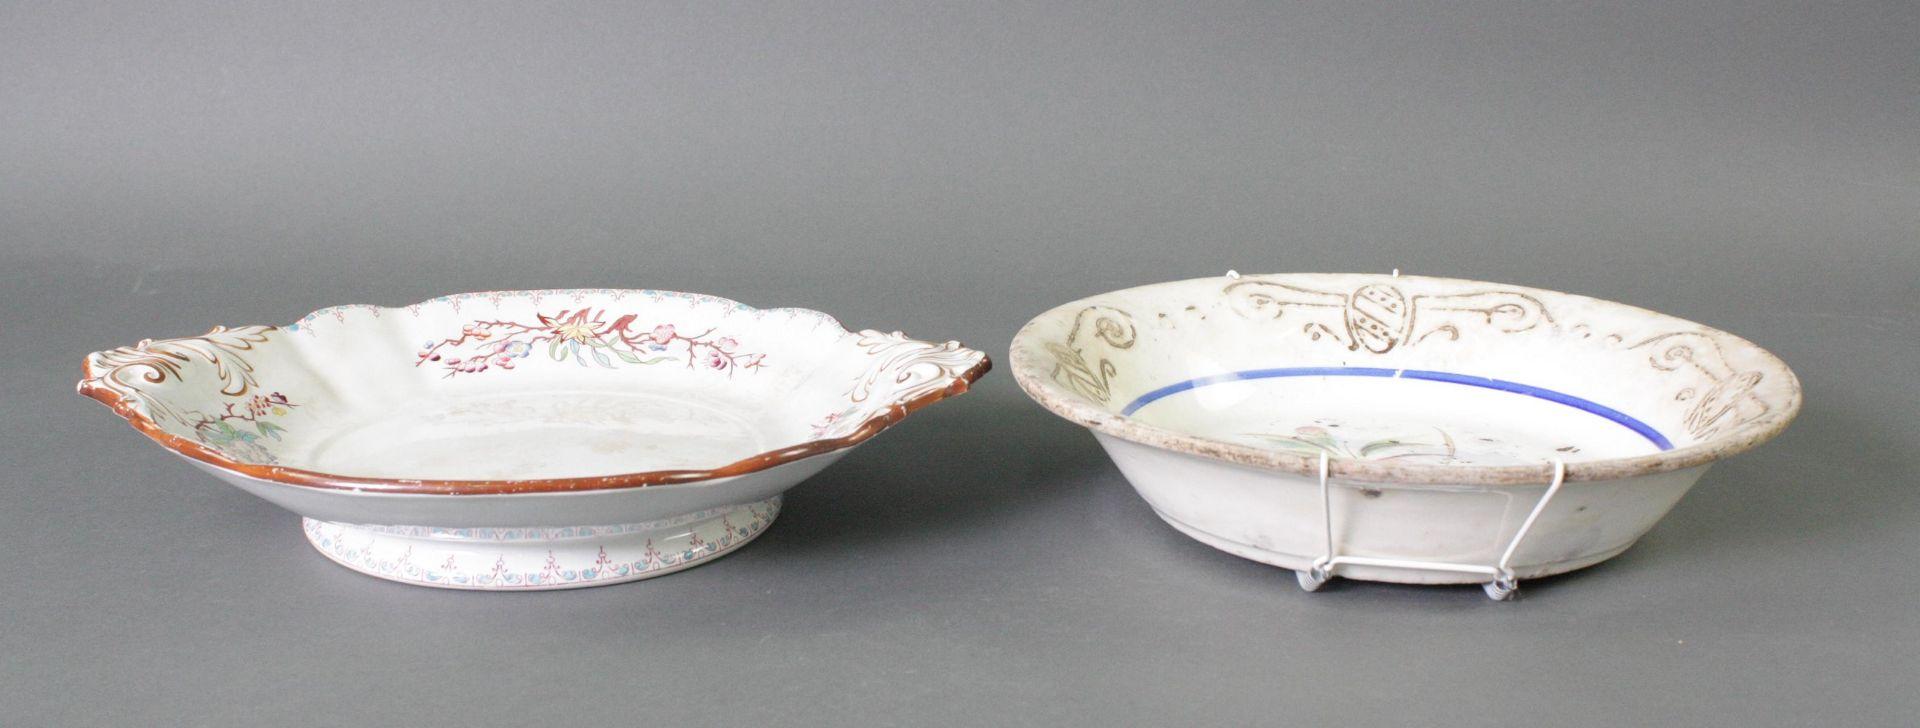 2 Keramikschalen 19. Jahrhundert - Bild 2 aus 3